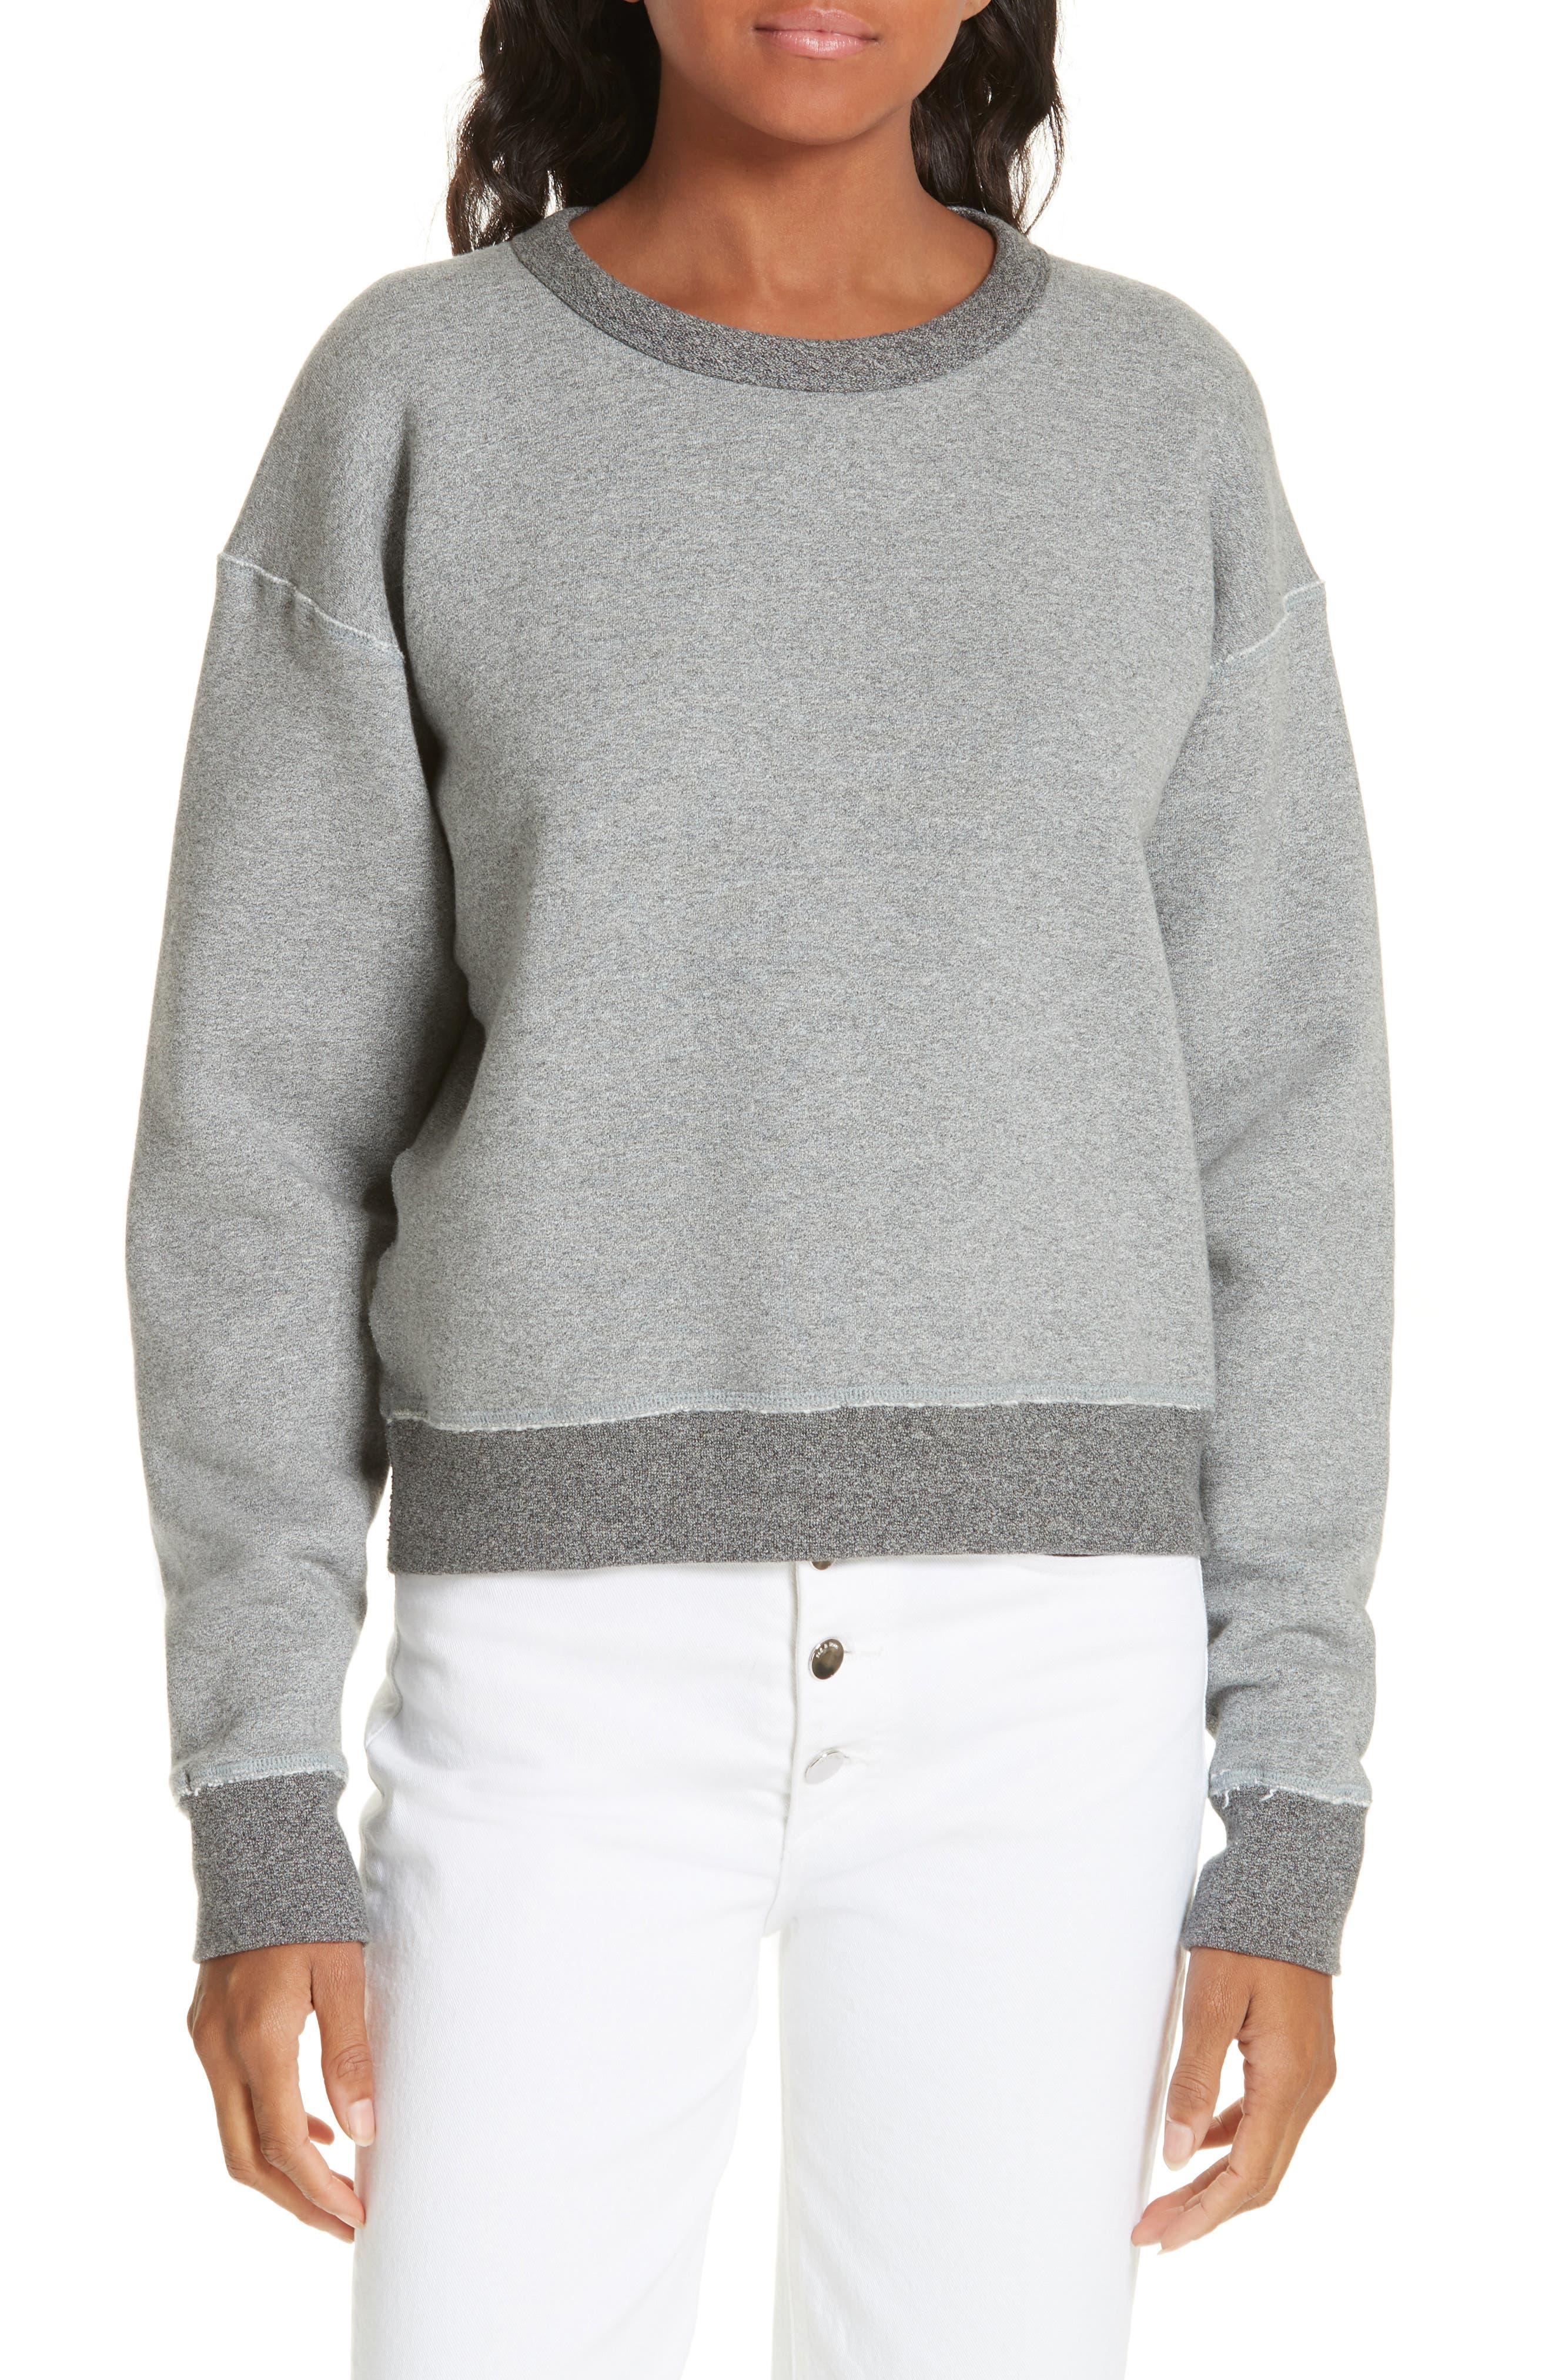 rag & bone Best Sweatshirt,                         Main,                         color, HEATHER GREY